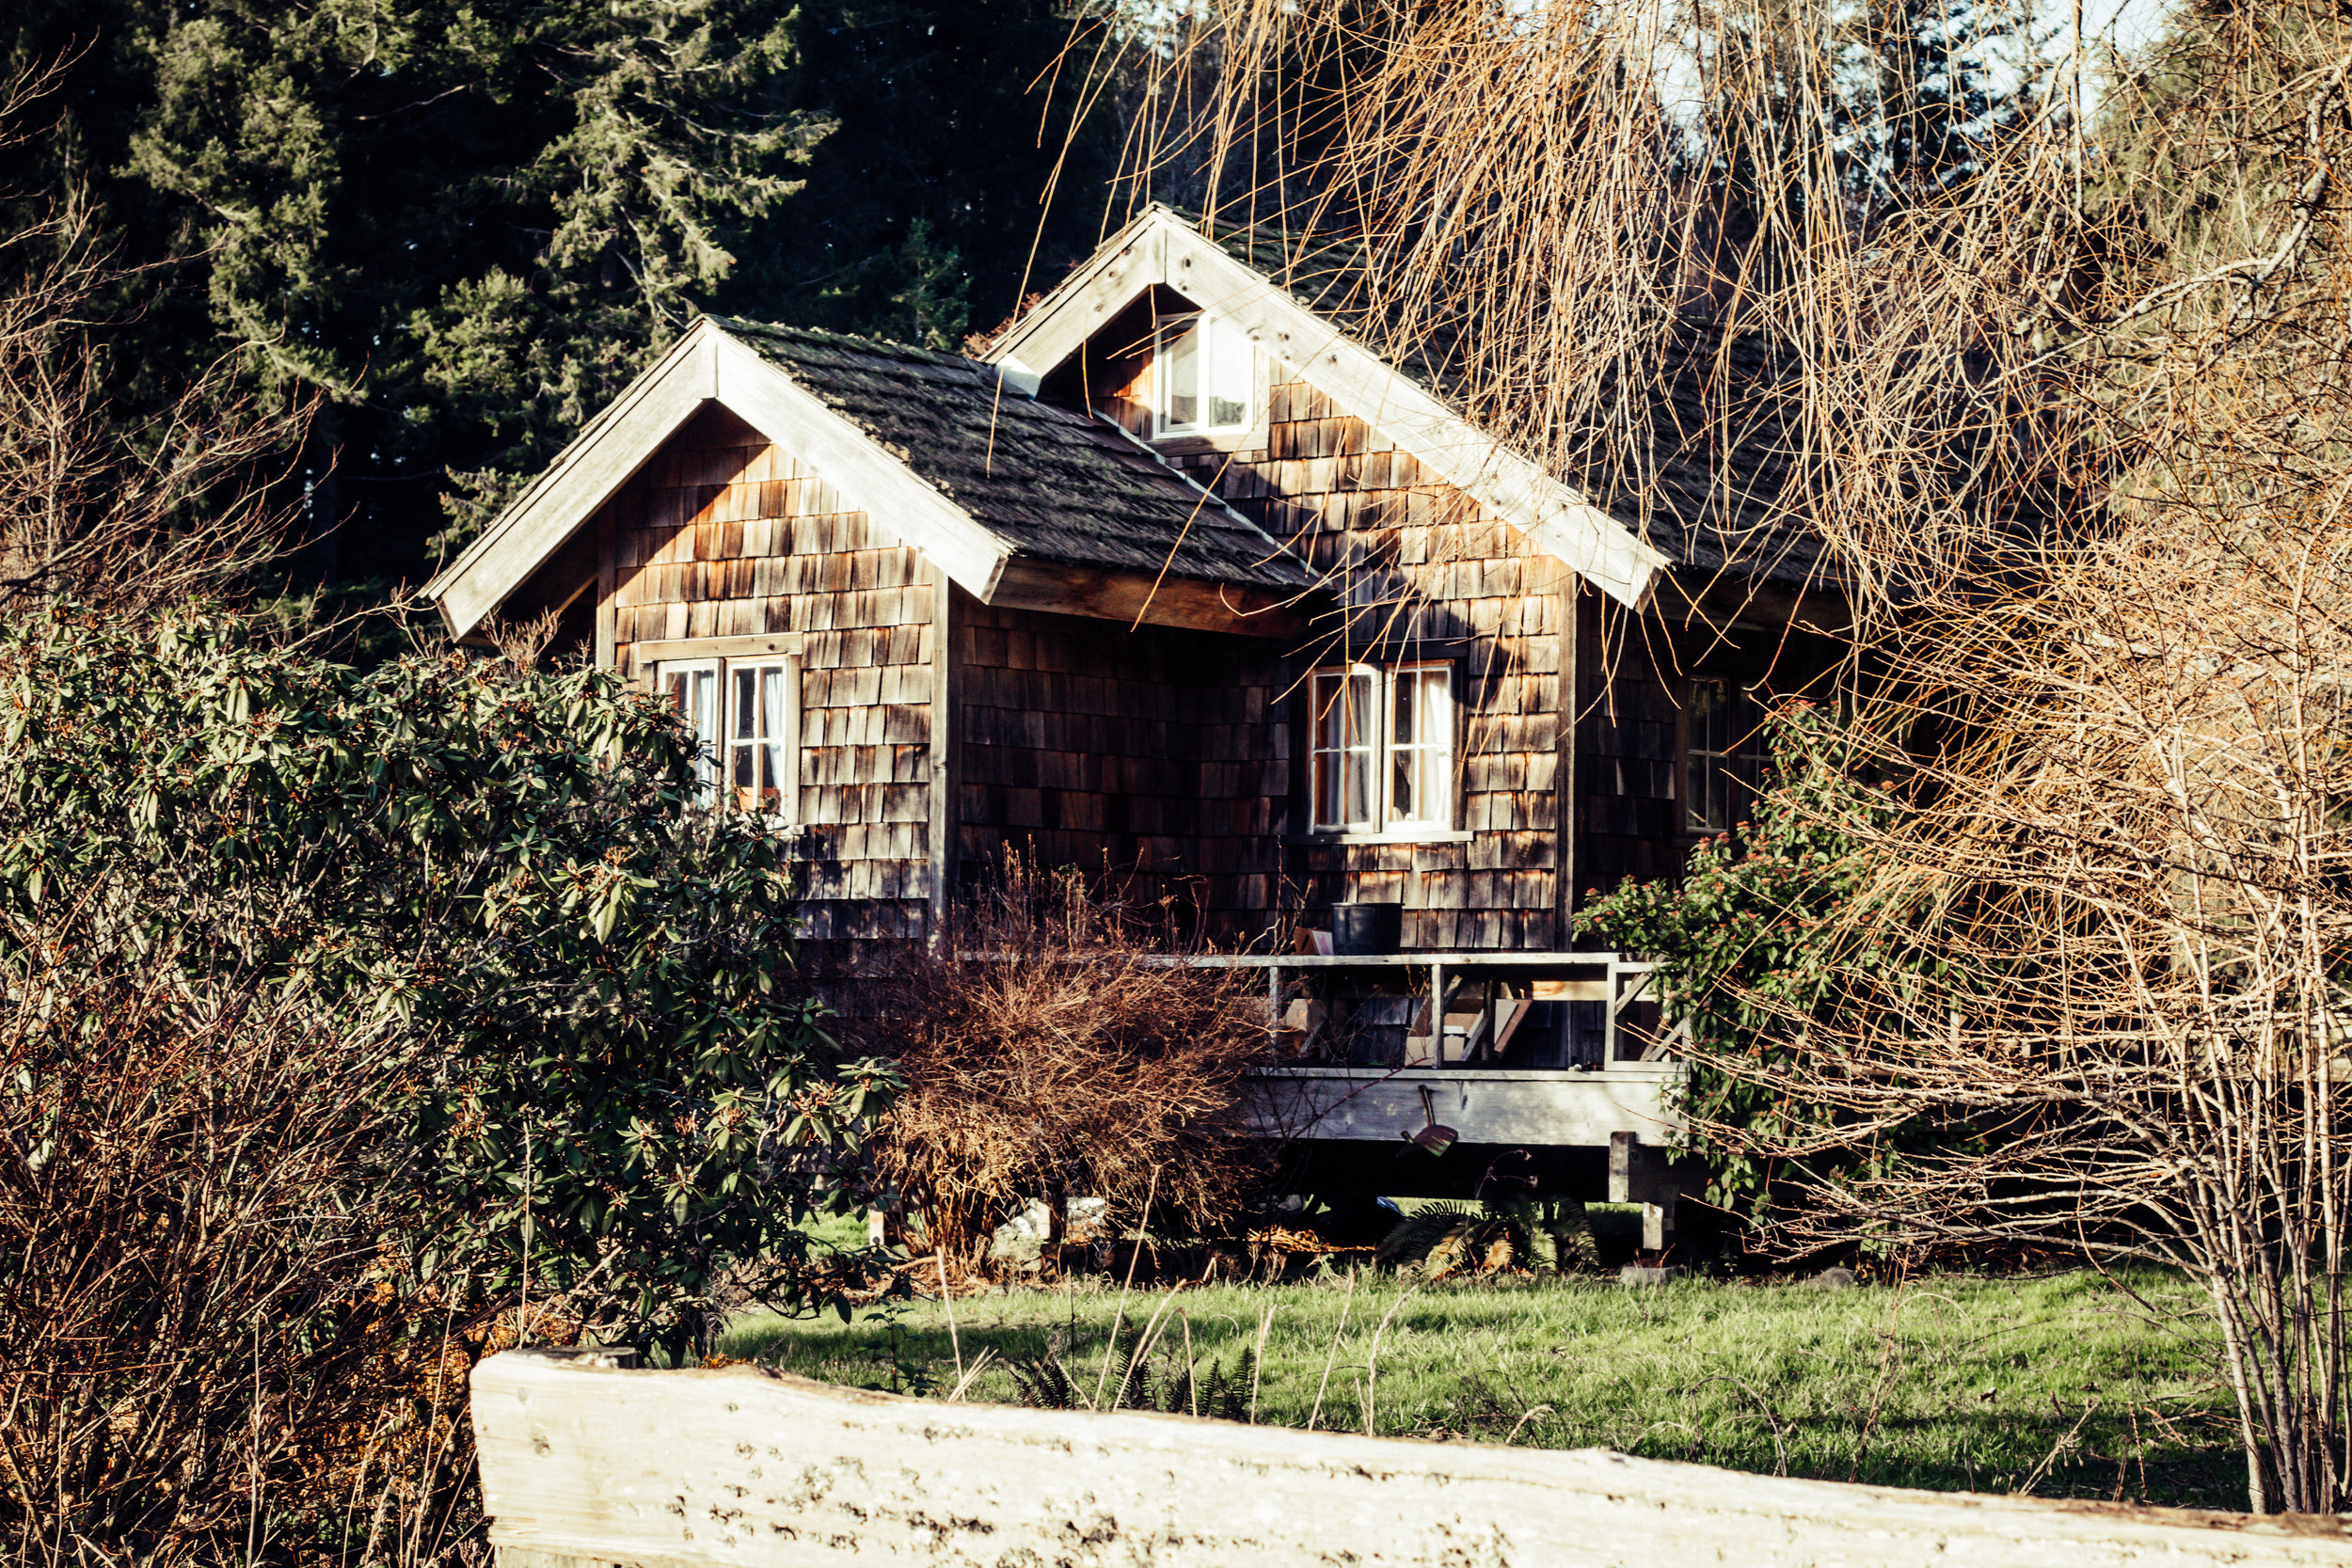 South Meadow Cabin